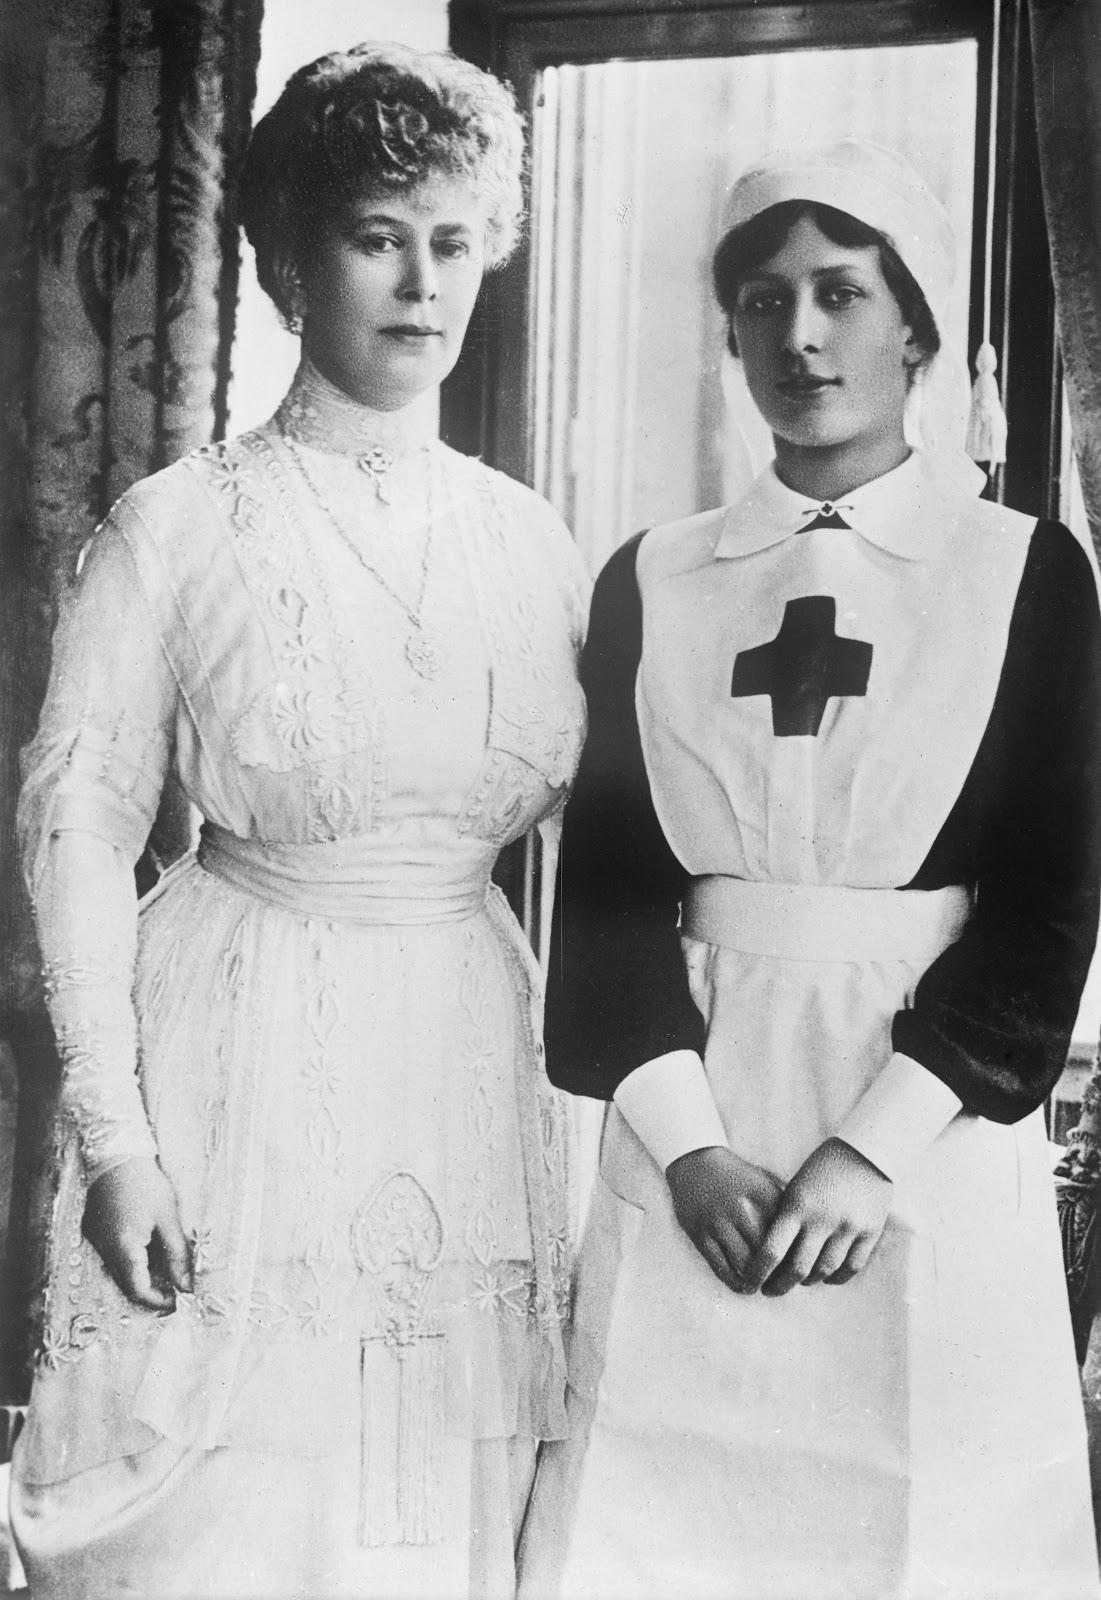 Mary, Princess Royal of the United Kingdom